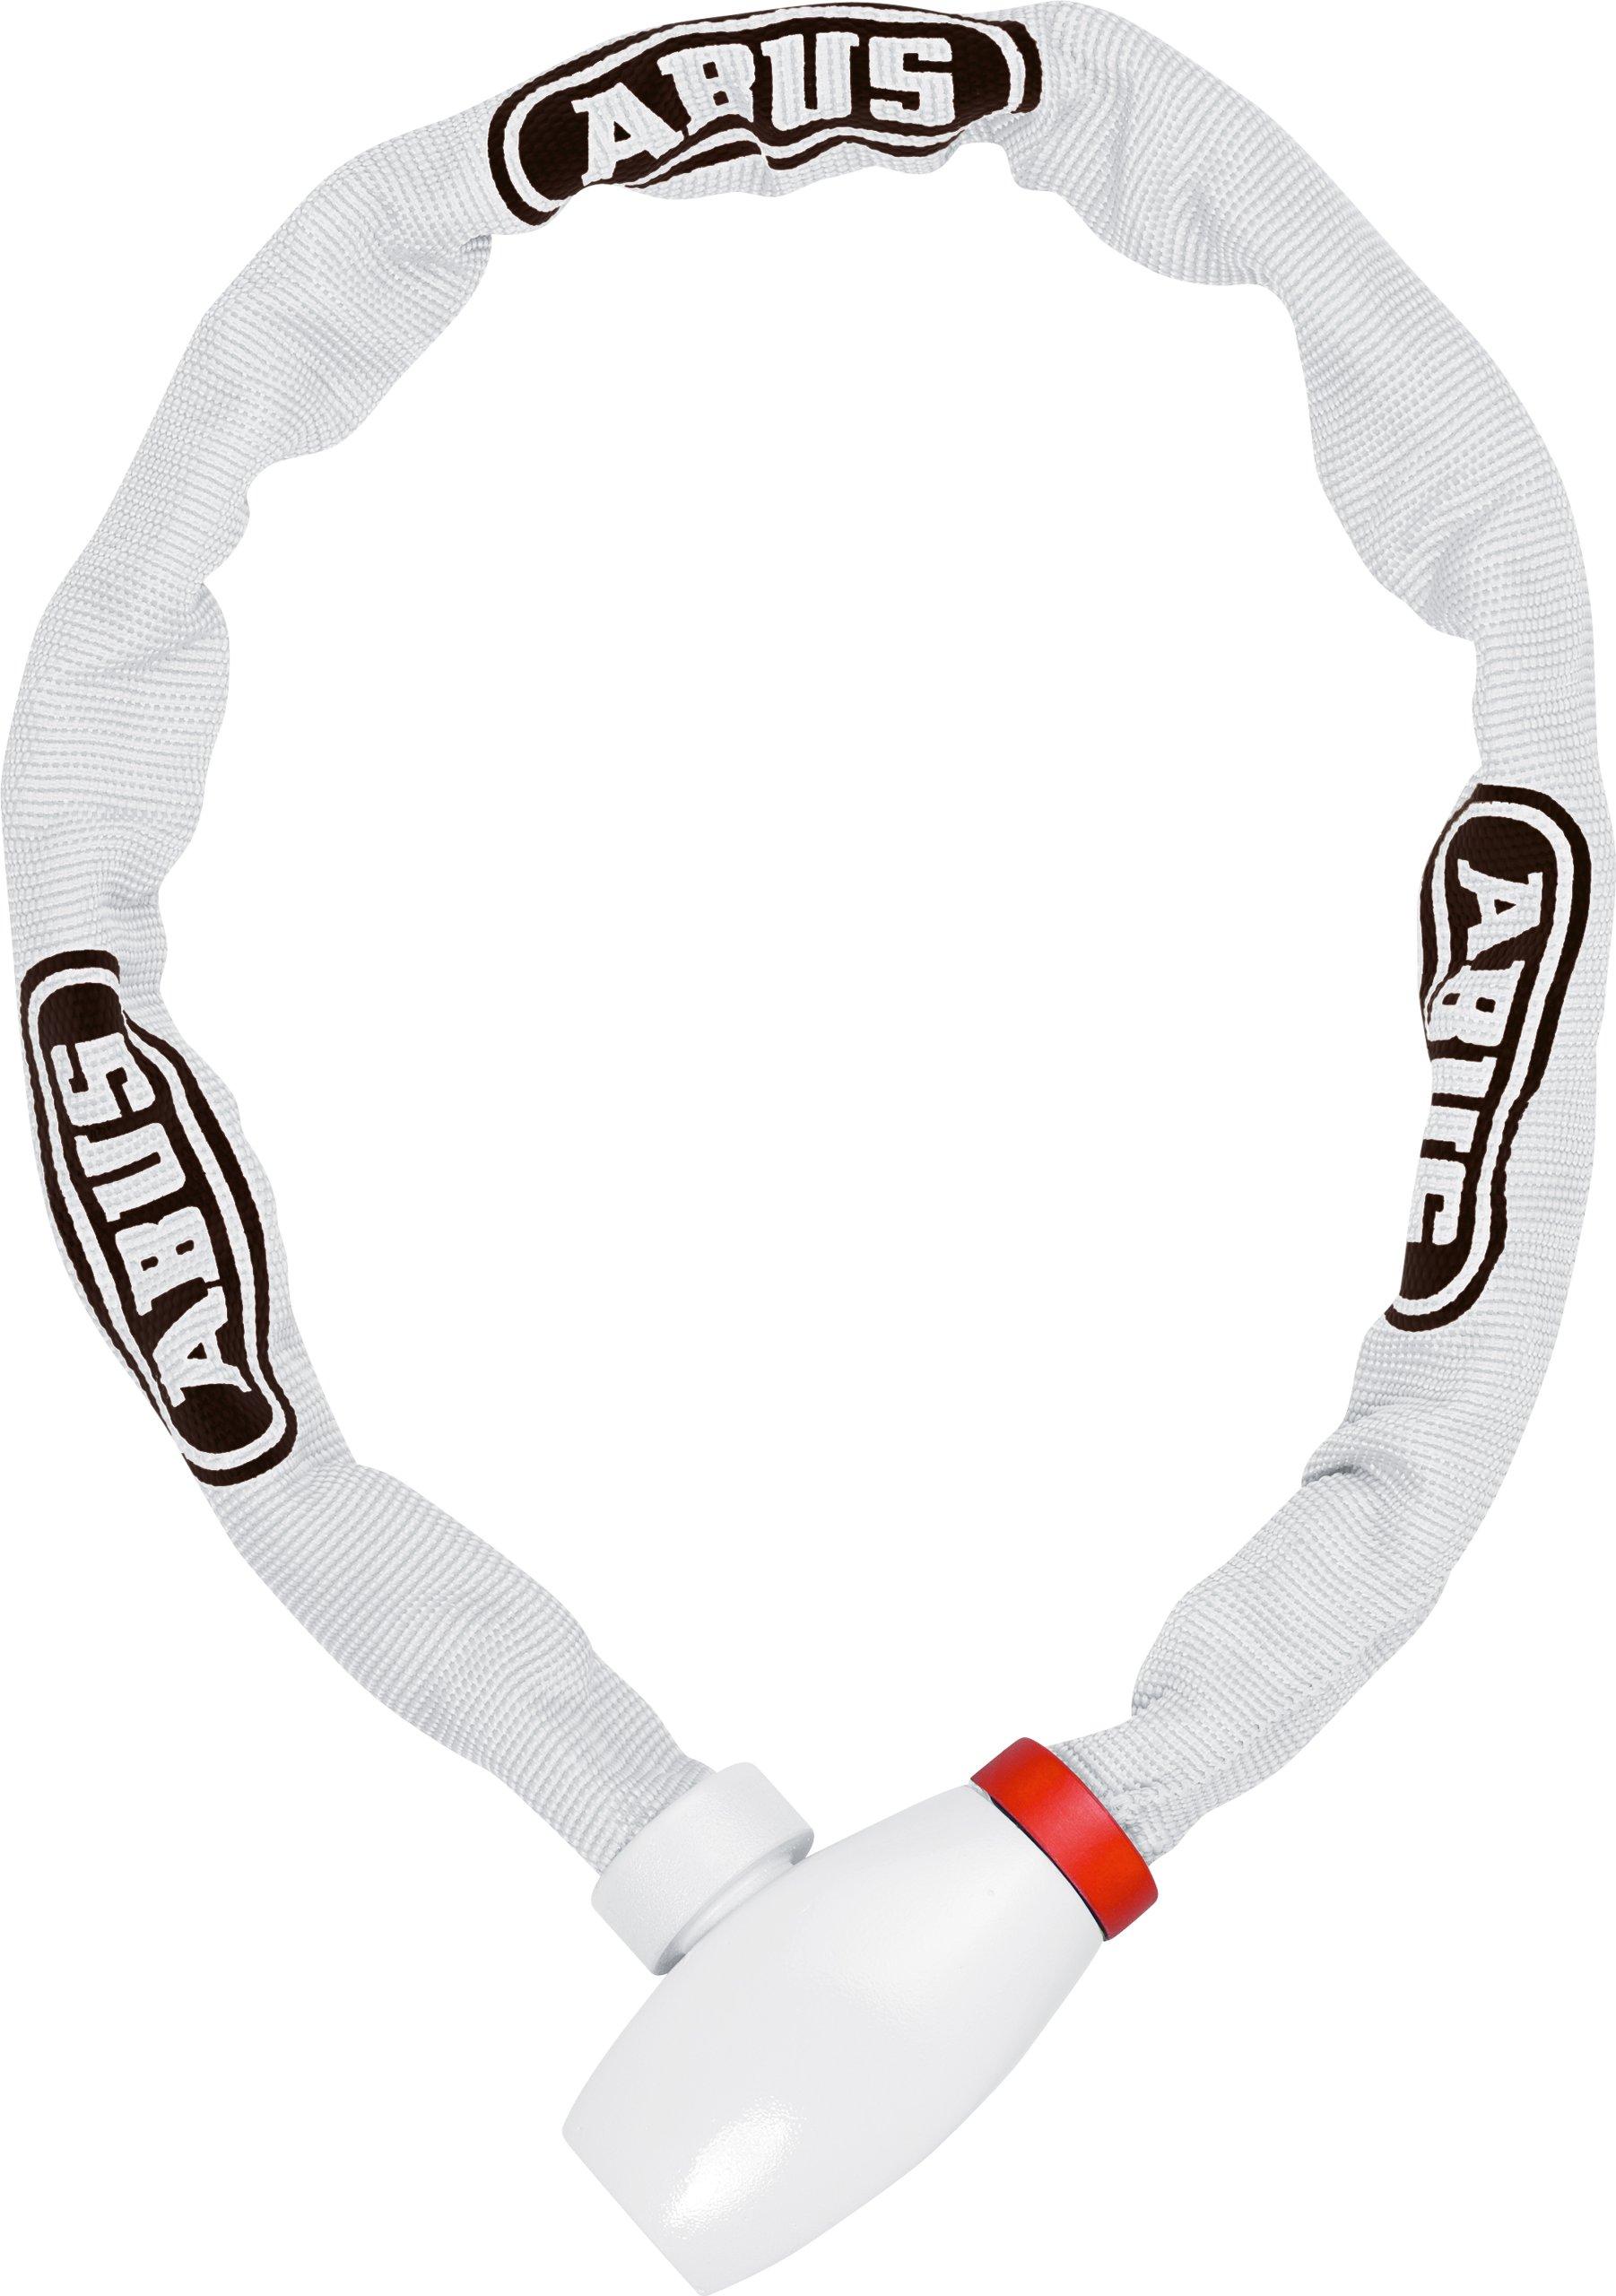 Abus uGrip 585/75 Bicycle Chain Lock, White, 75cm/5mm